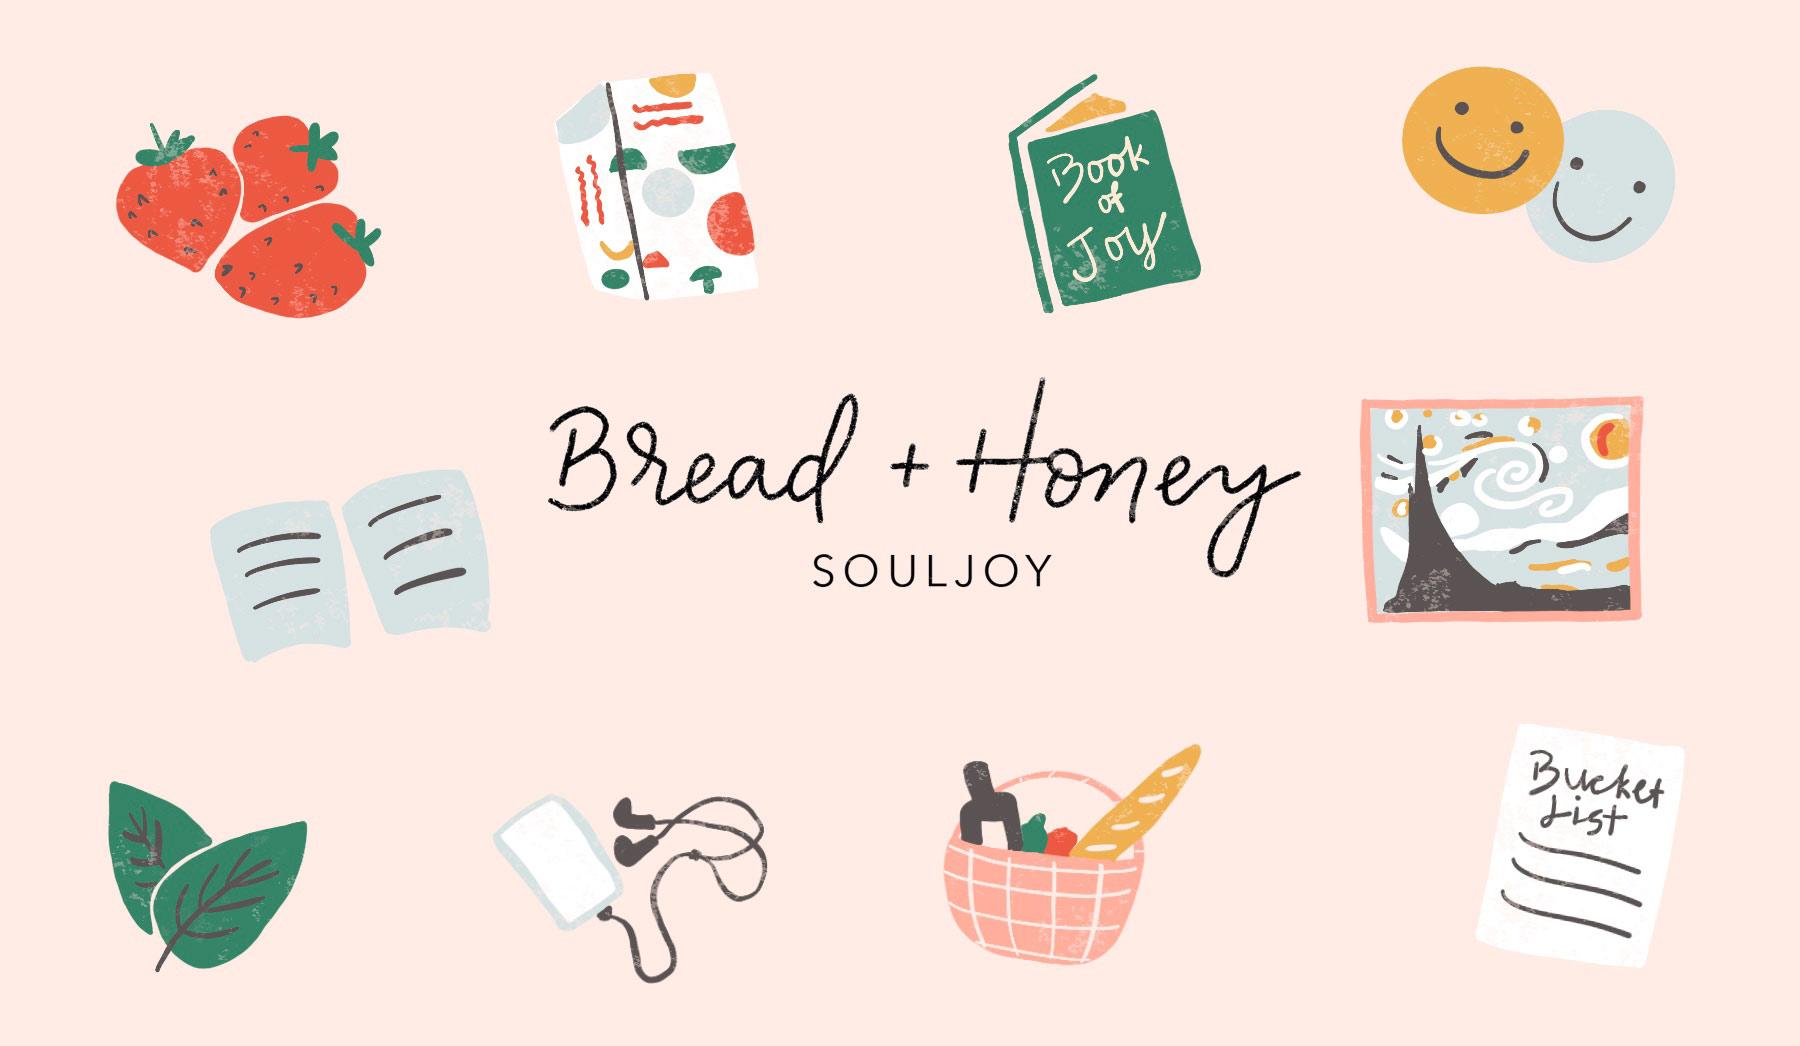 Bread and Honey Souljoy